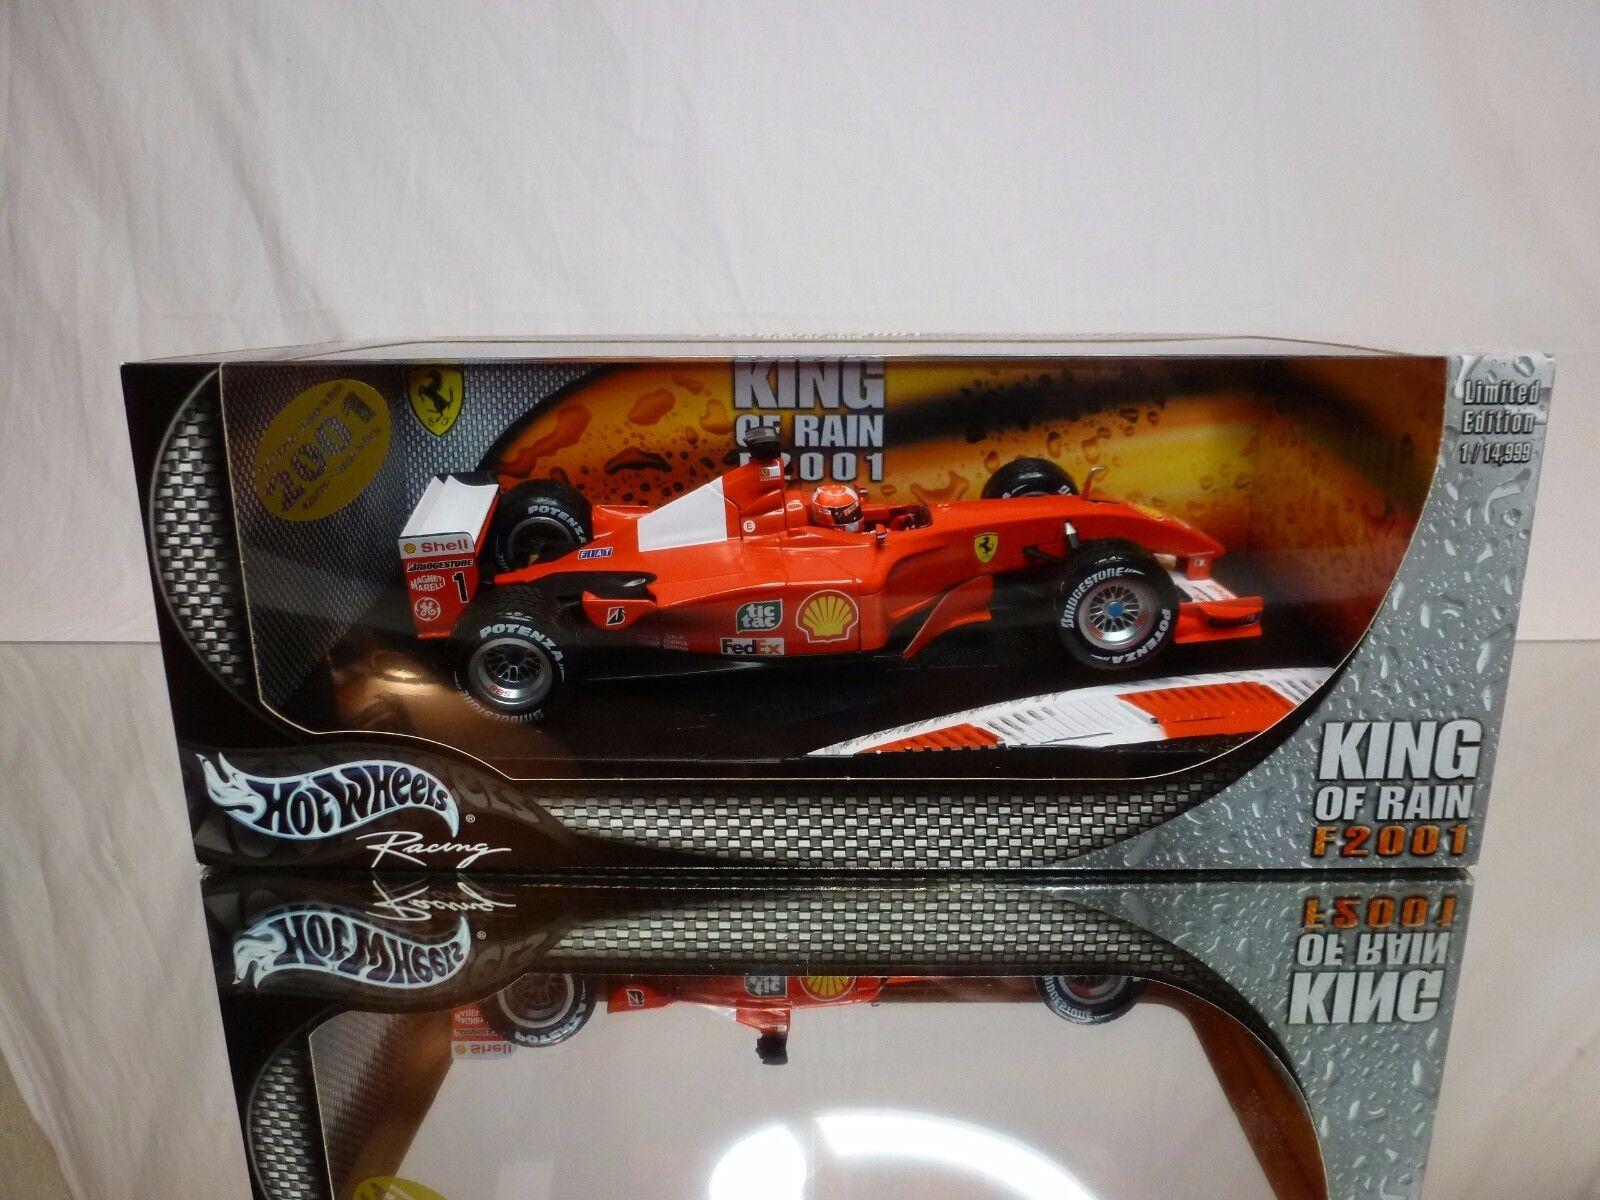 HOT WHEELS FERRARI F2001 KING of RAIN - SCHUMACHER - F1 1 18 - EXCELLENT IN BOX